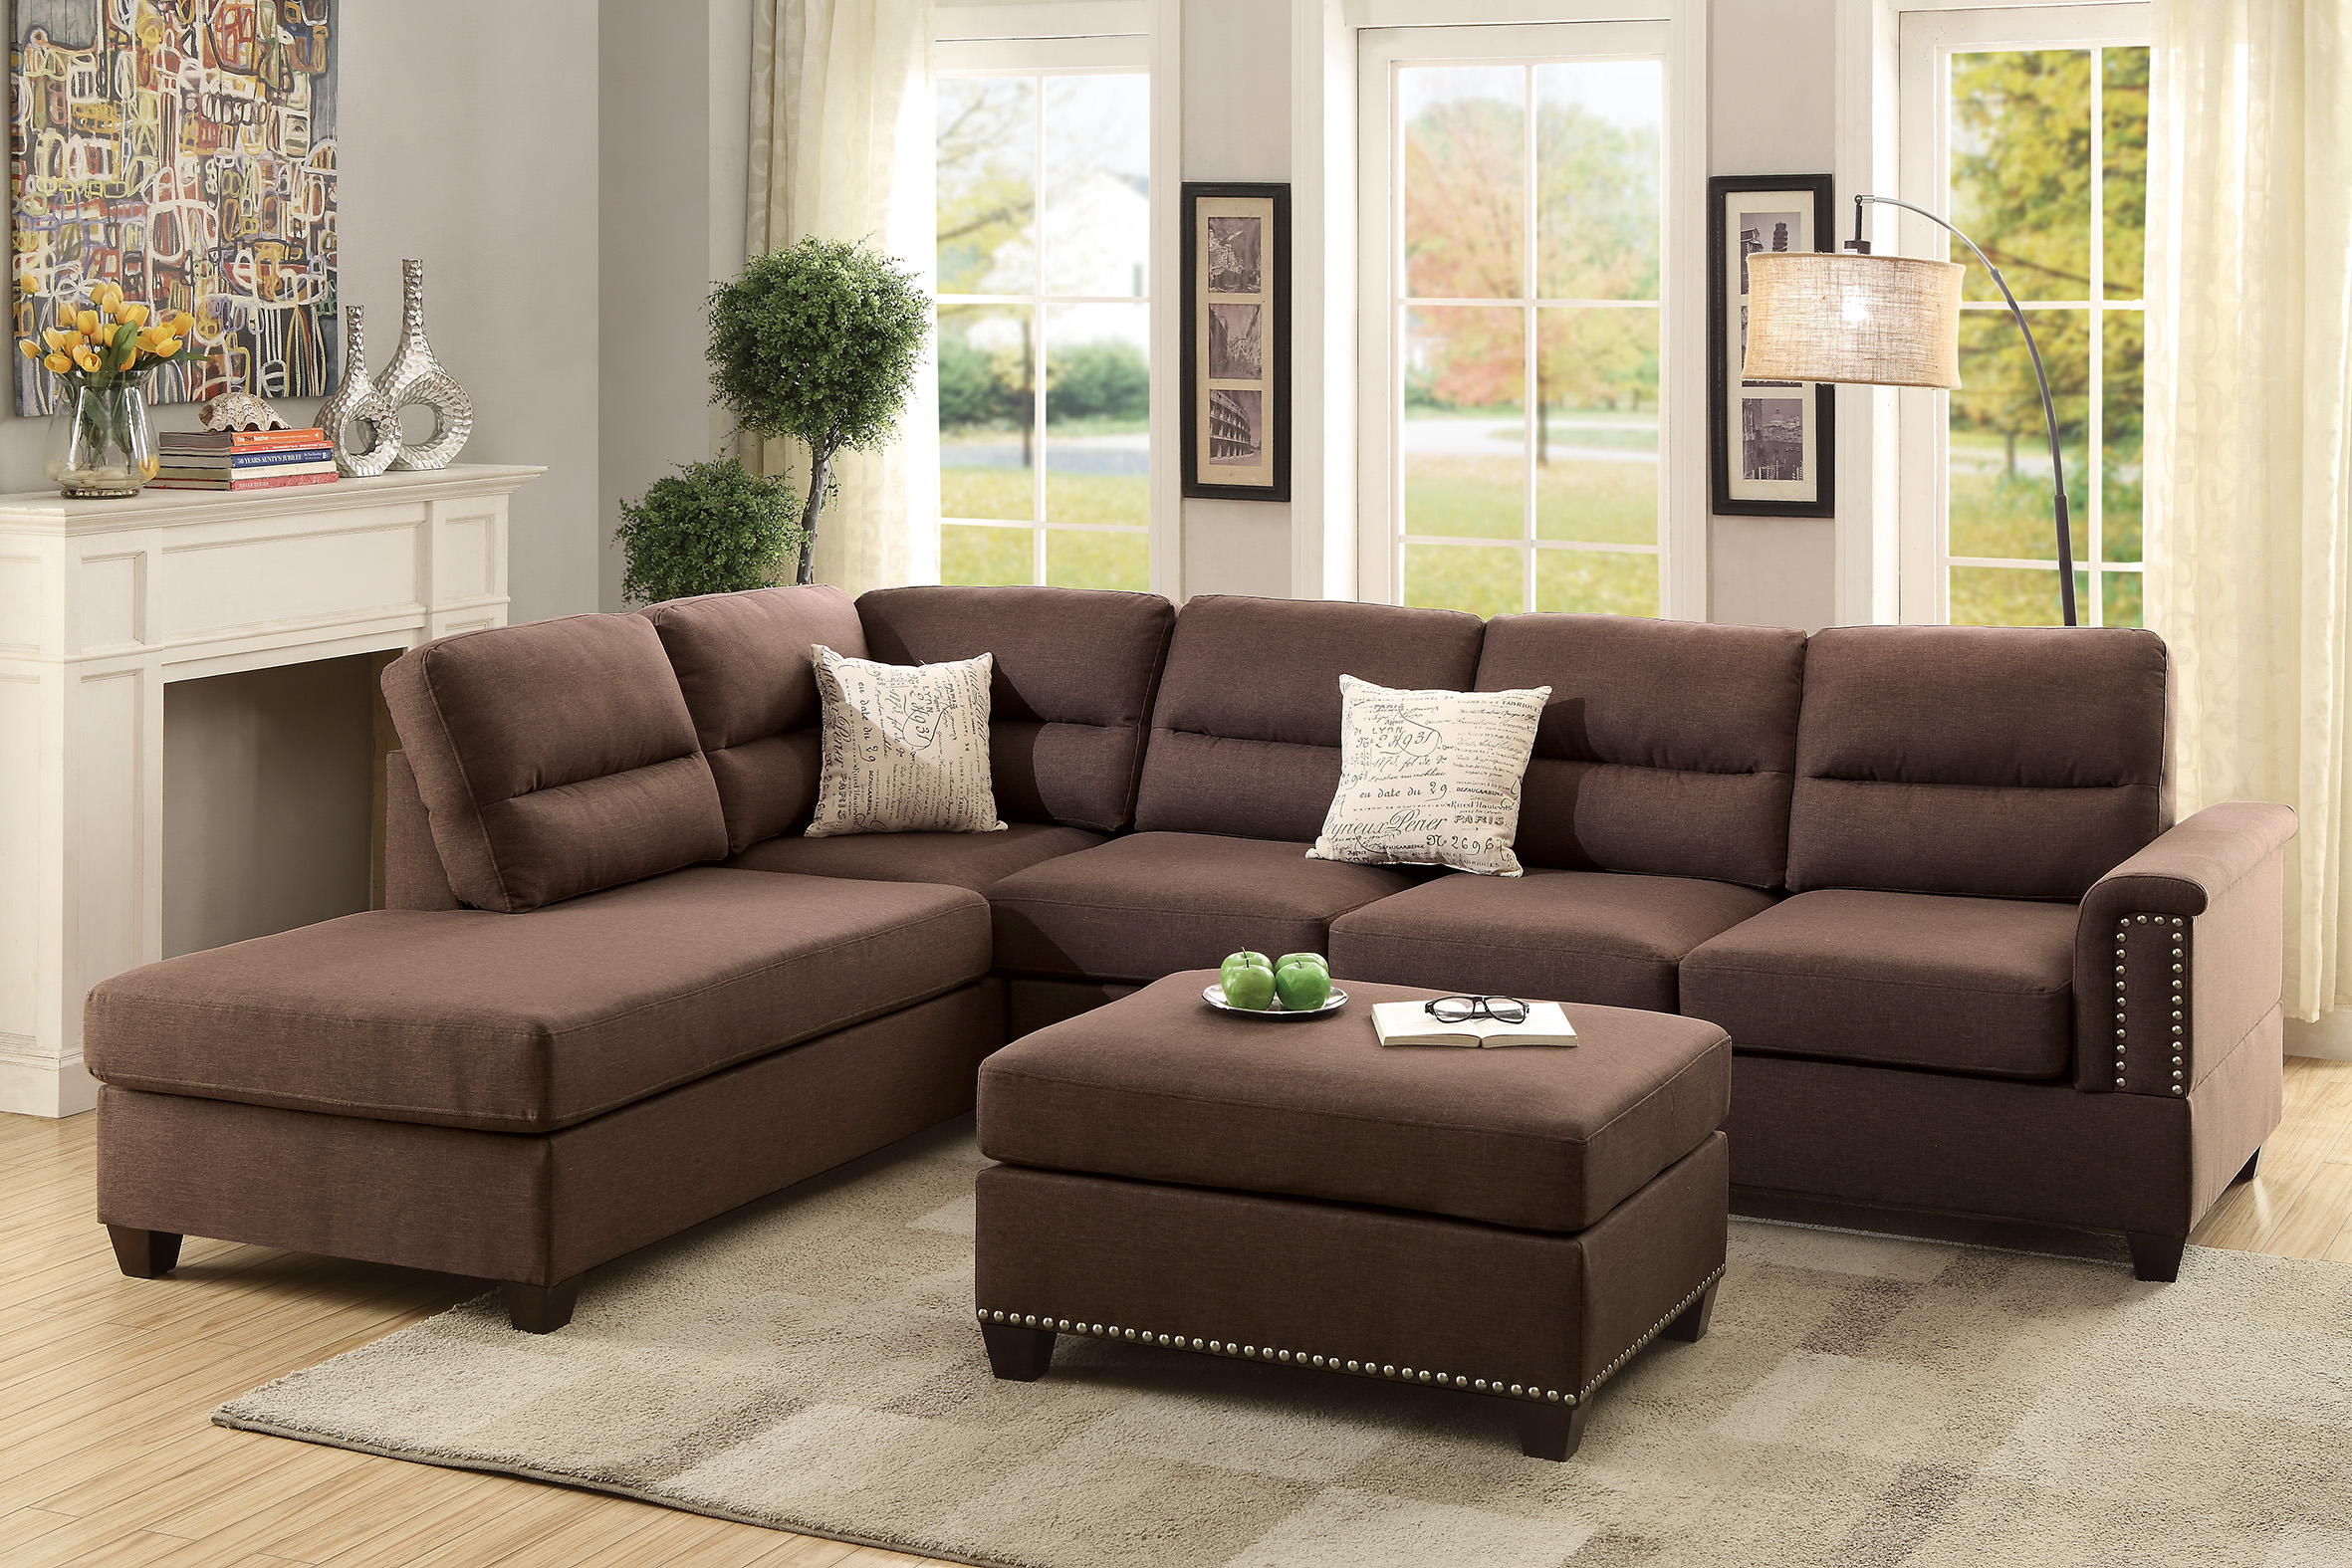 Awe Inspiring F7613 Chocolate Sectional Sofa Set By Poundex Creativecarmelina Interior Chair Design Creativecarmelinacom